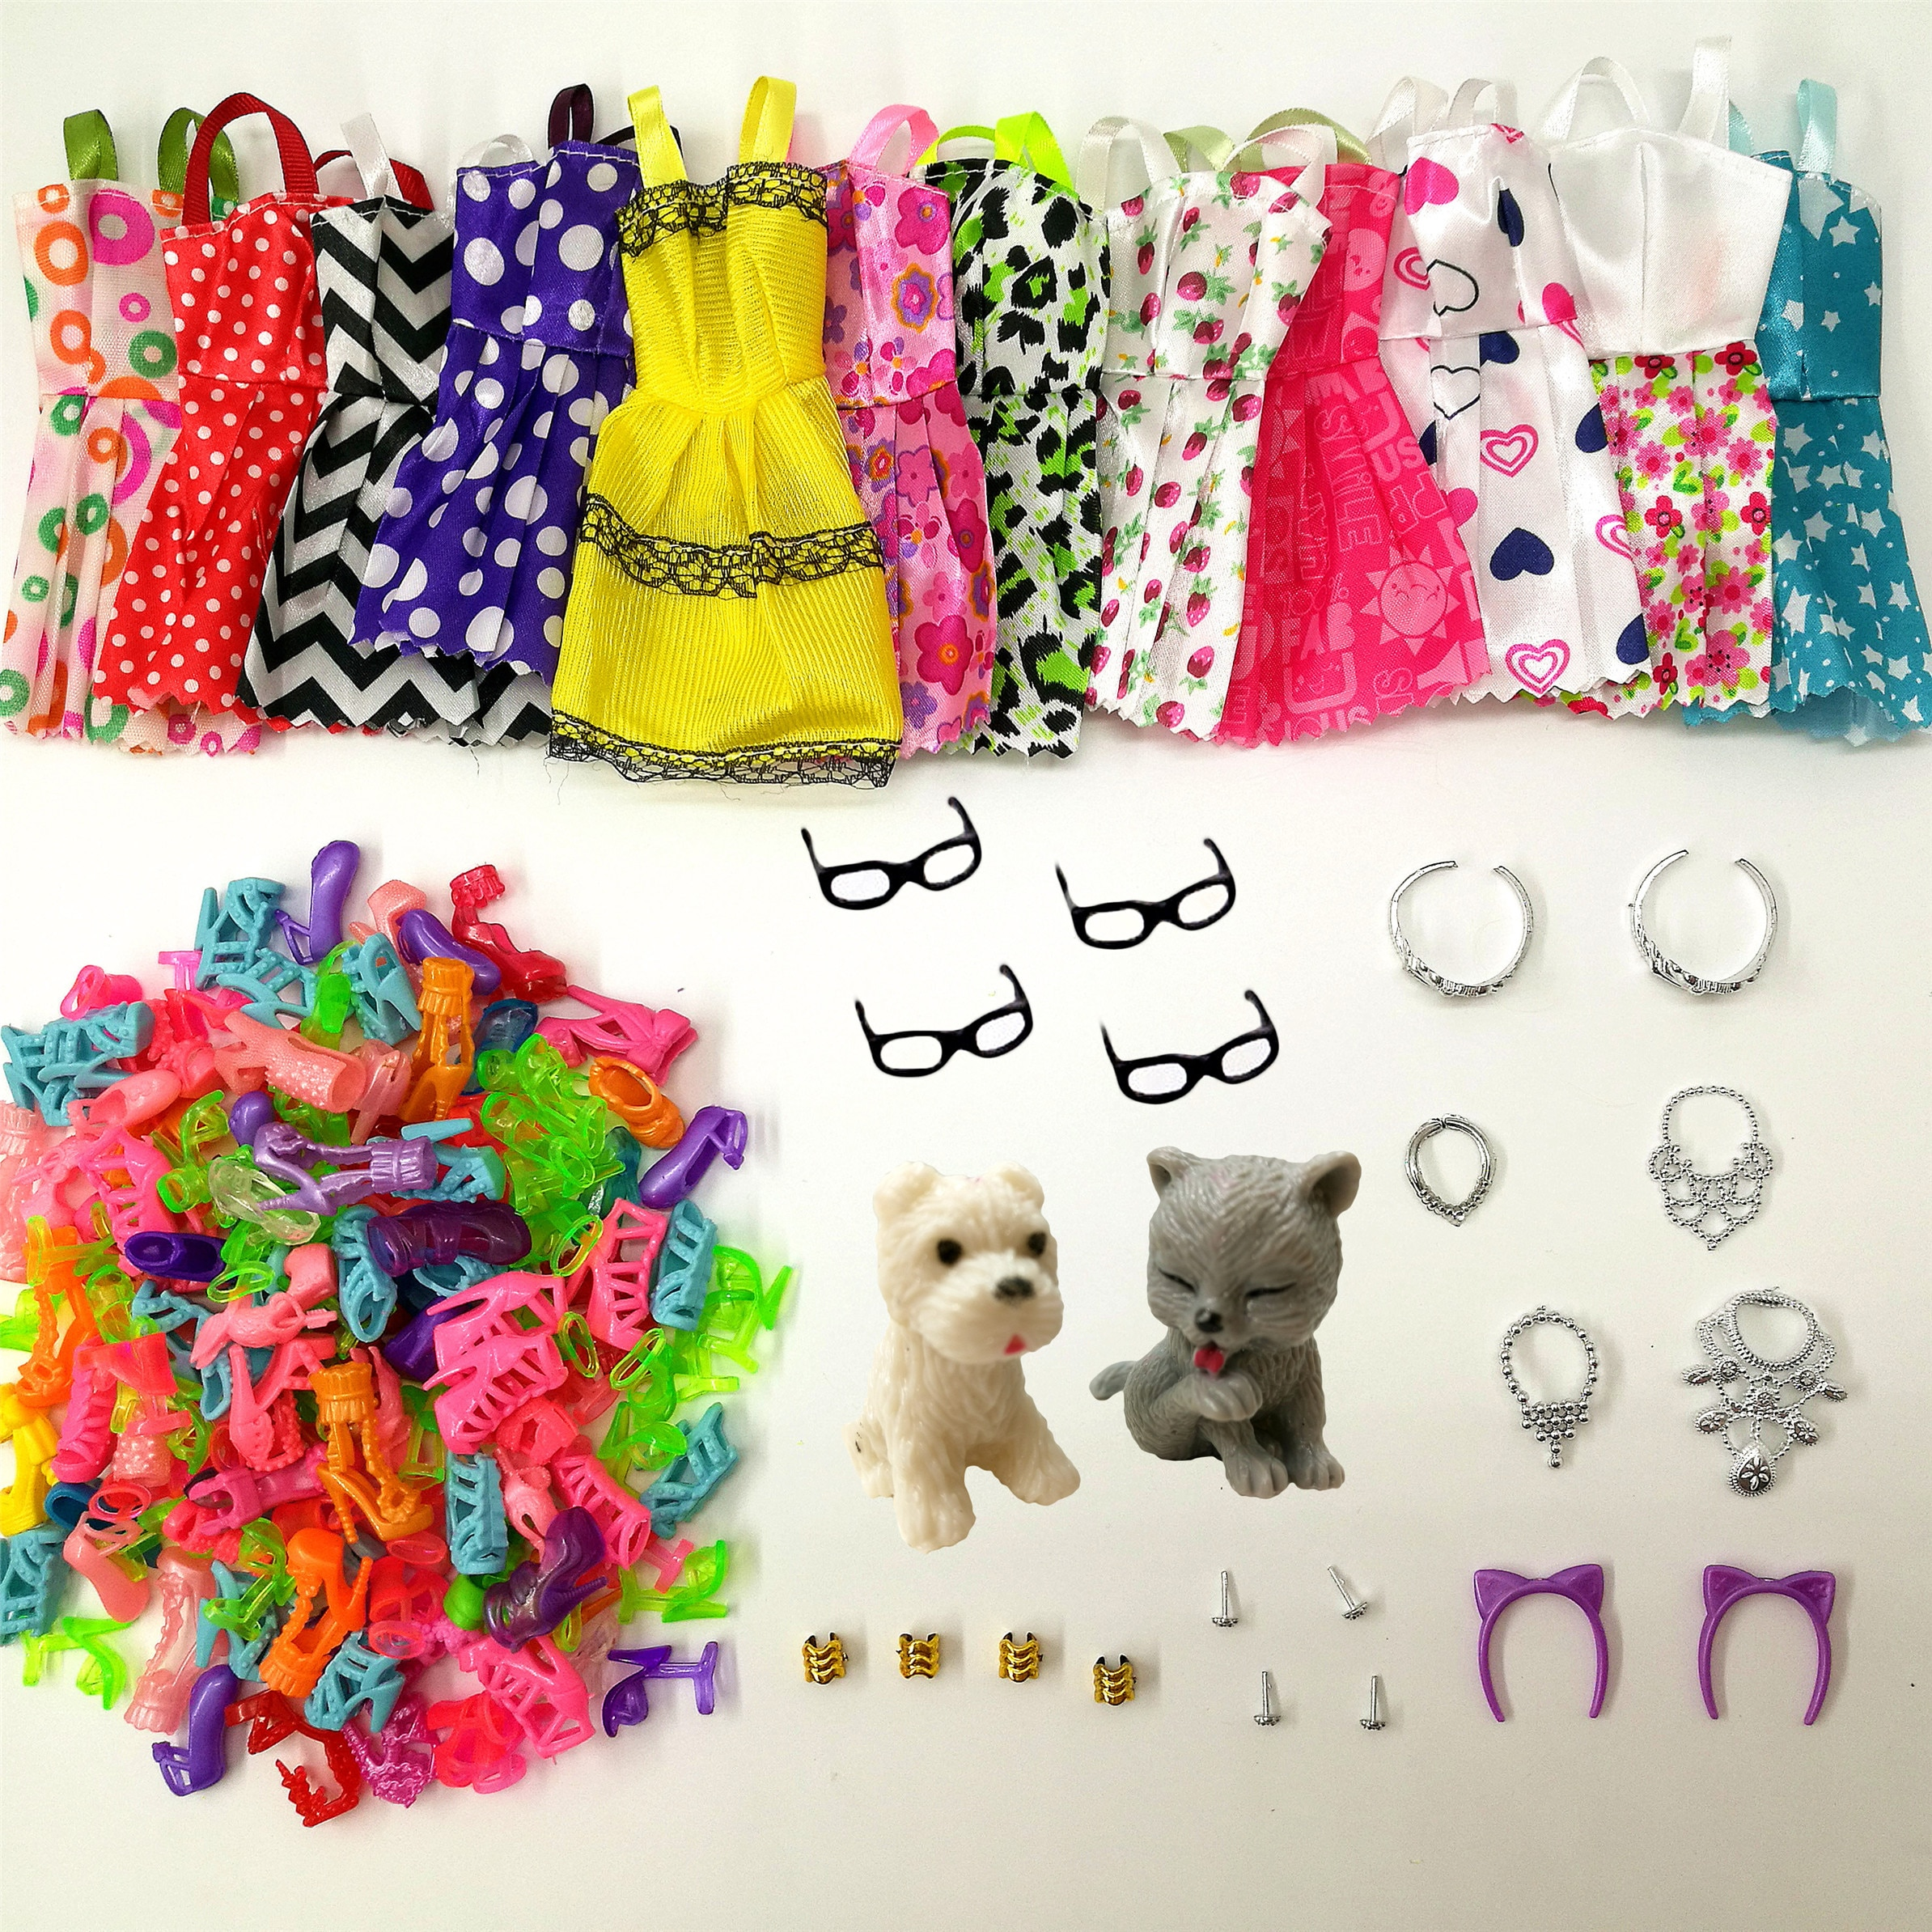 34 шт./комплект аксессуары для кукол = 8 шт. обувь + 4 Ожерелья 4 стекла 2 короны 2 куклы ПЭТ + 8 шт. Одежда для кукол для куклы Барби